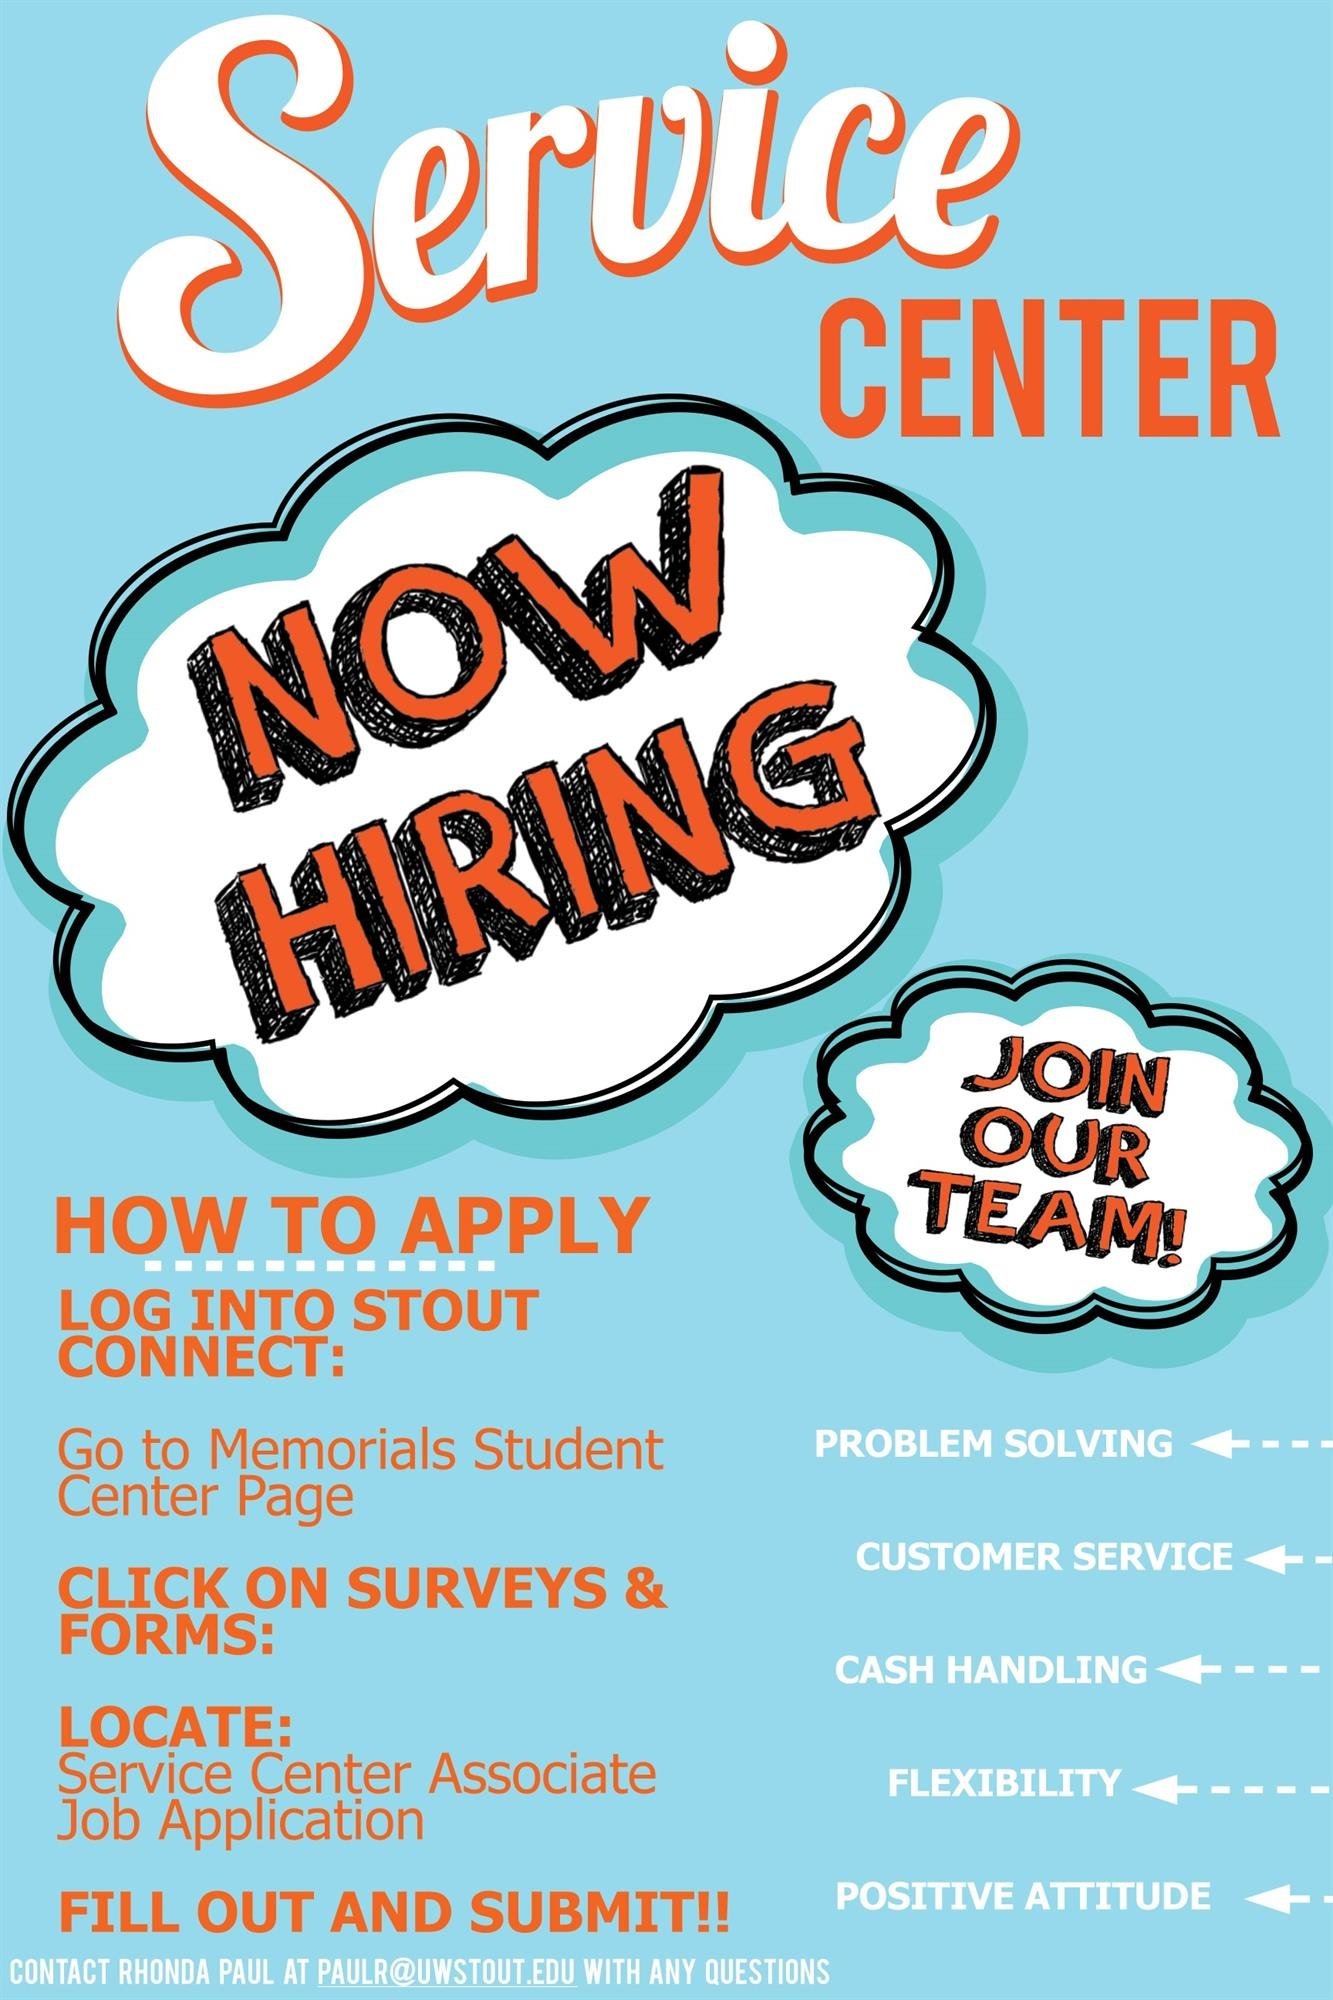 MSC Service Center Hiring